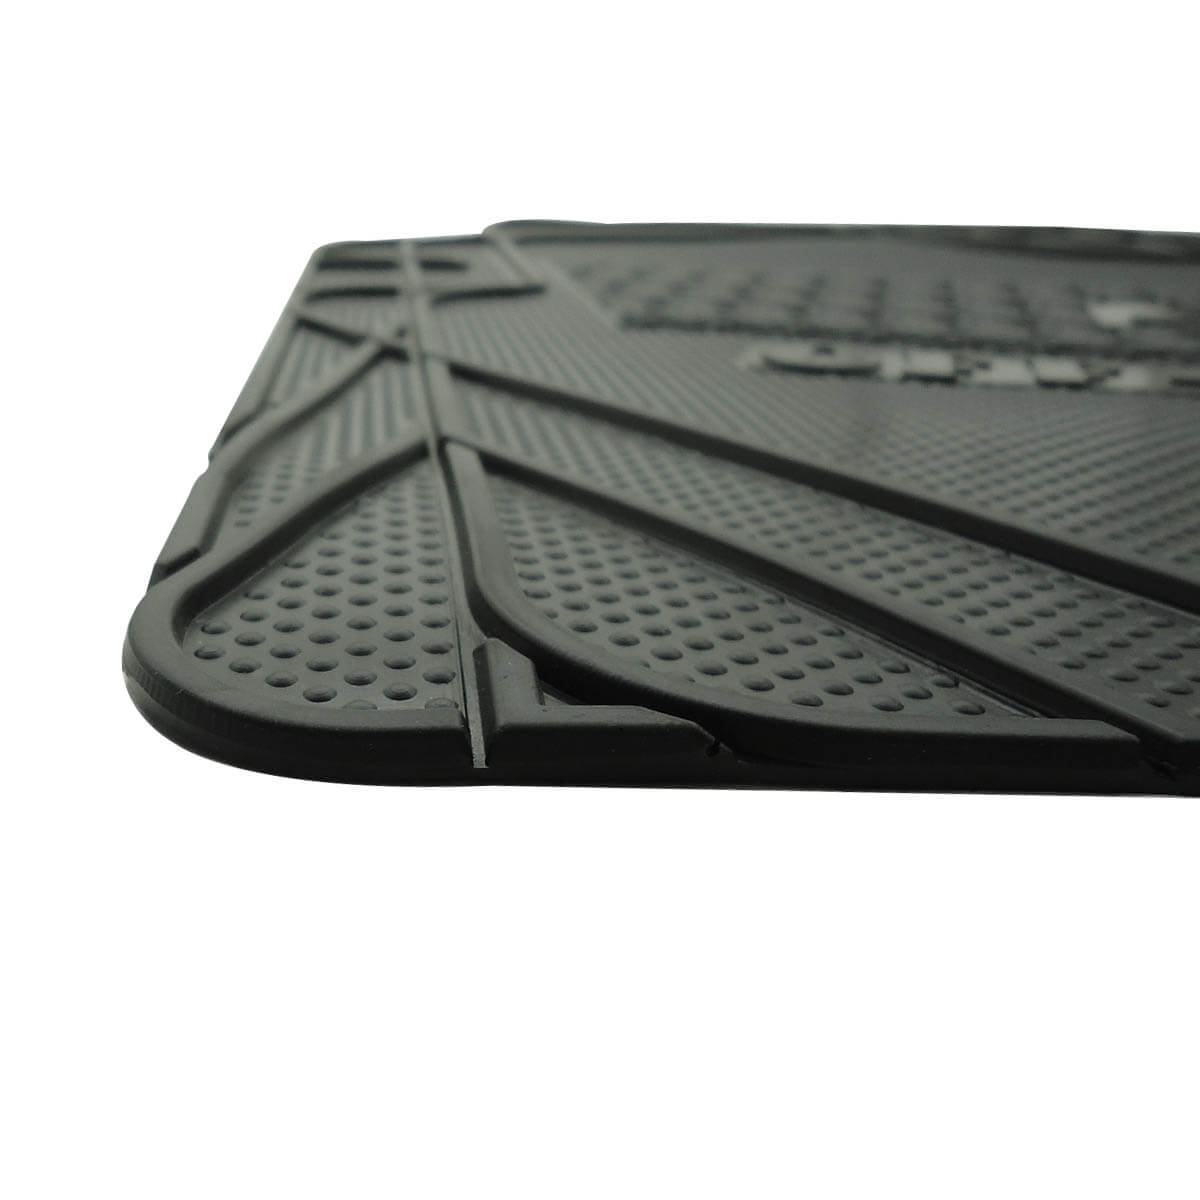 Tapete borracha PVC virgem Blazer 1996 a 2011 ou S10 cabine dupla 1997 a 2011